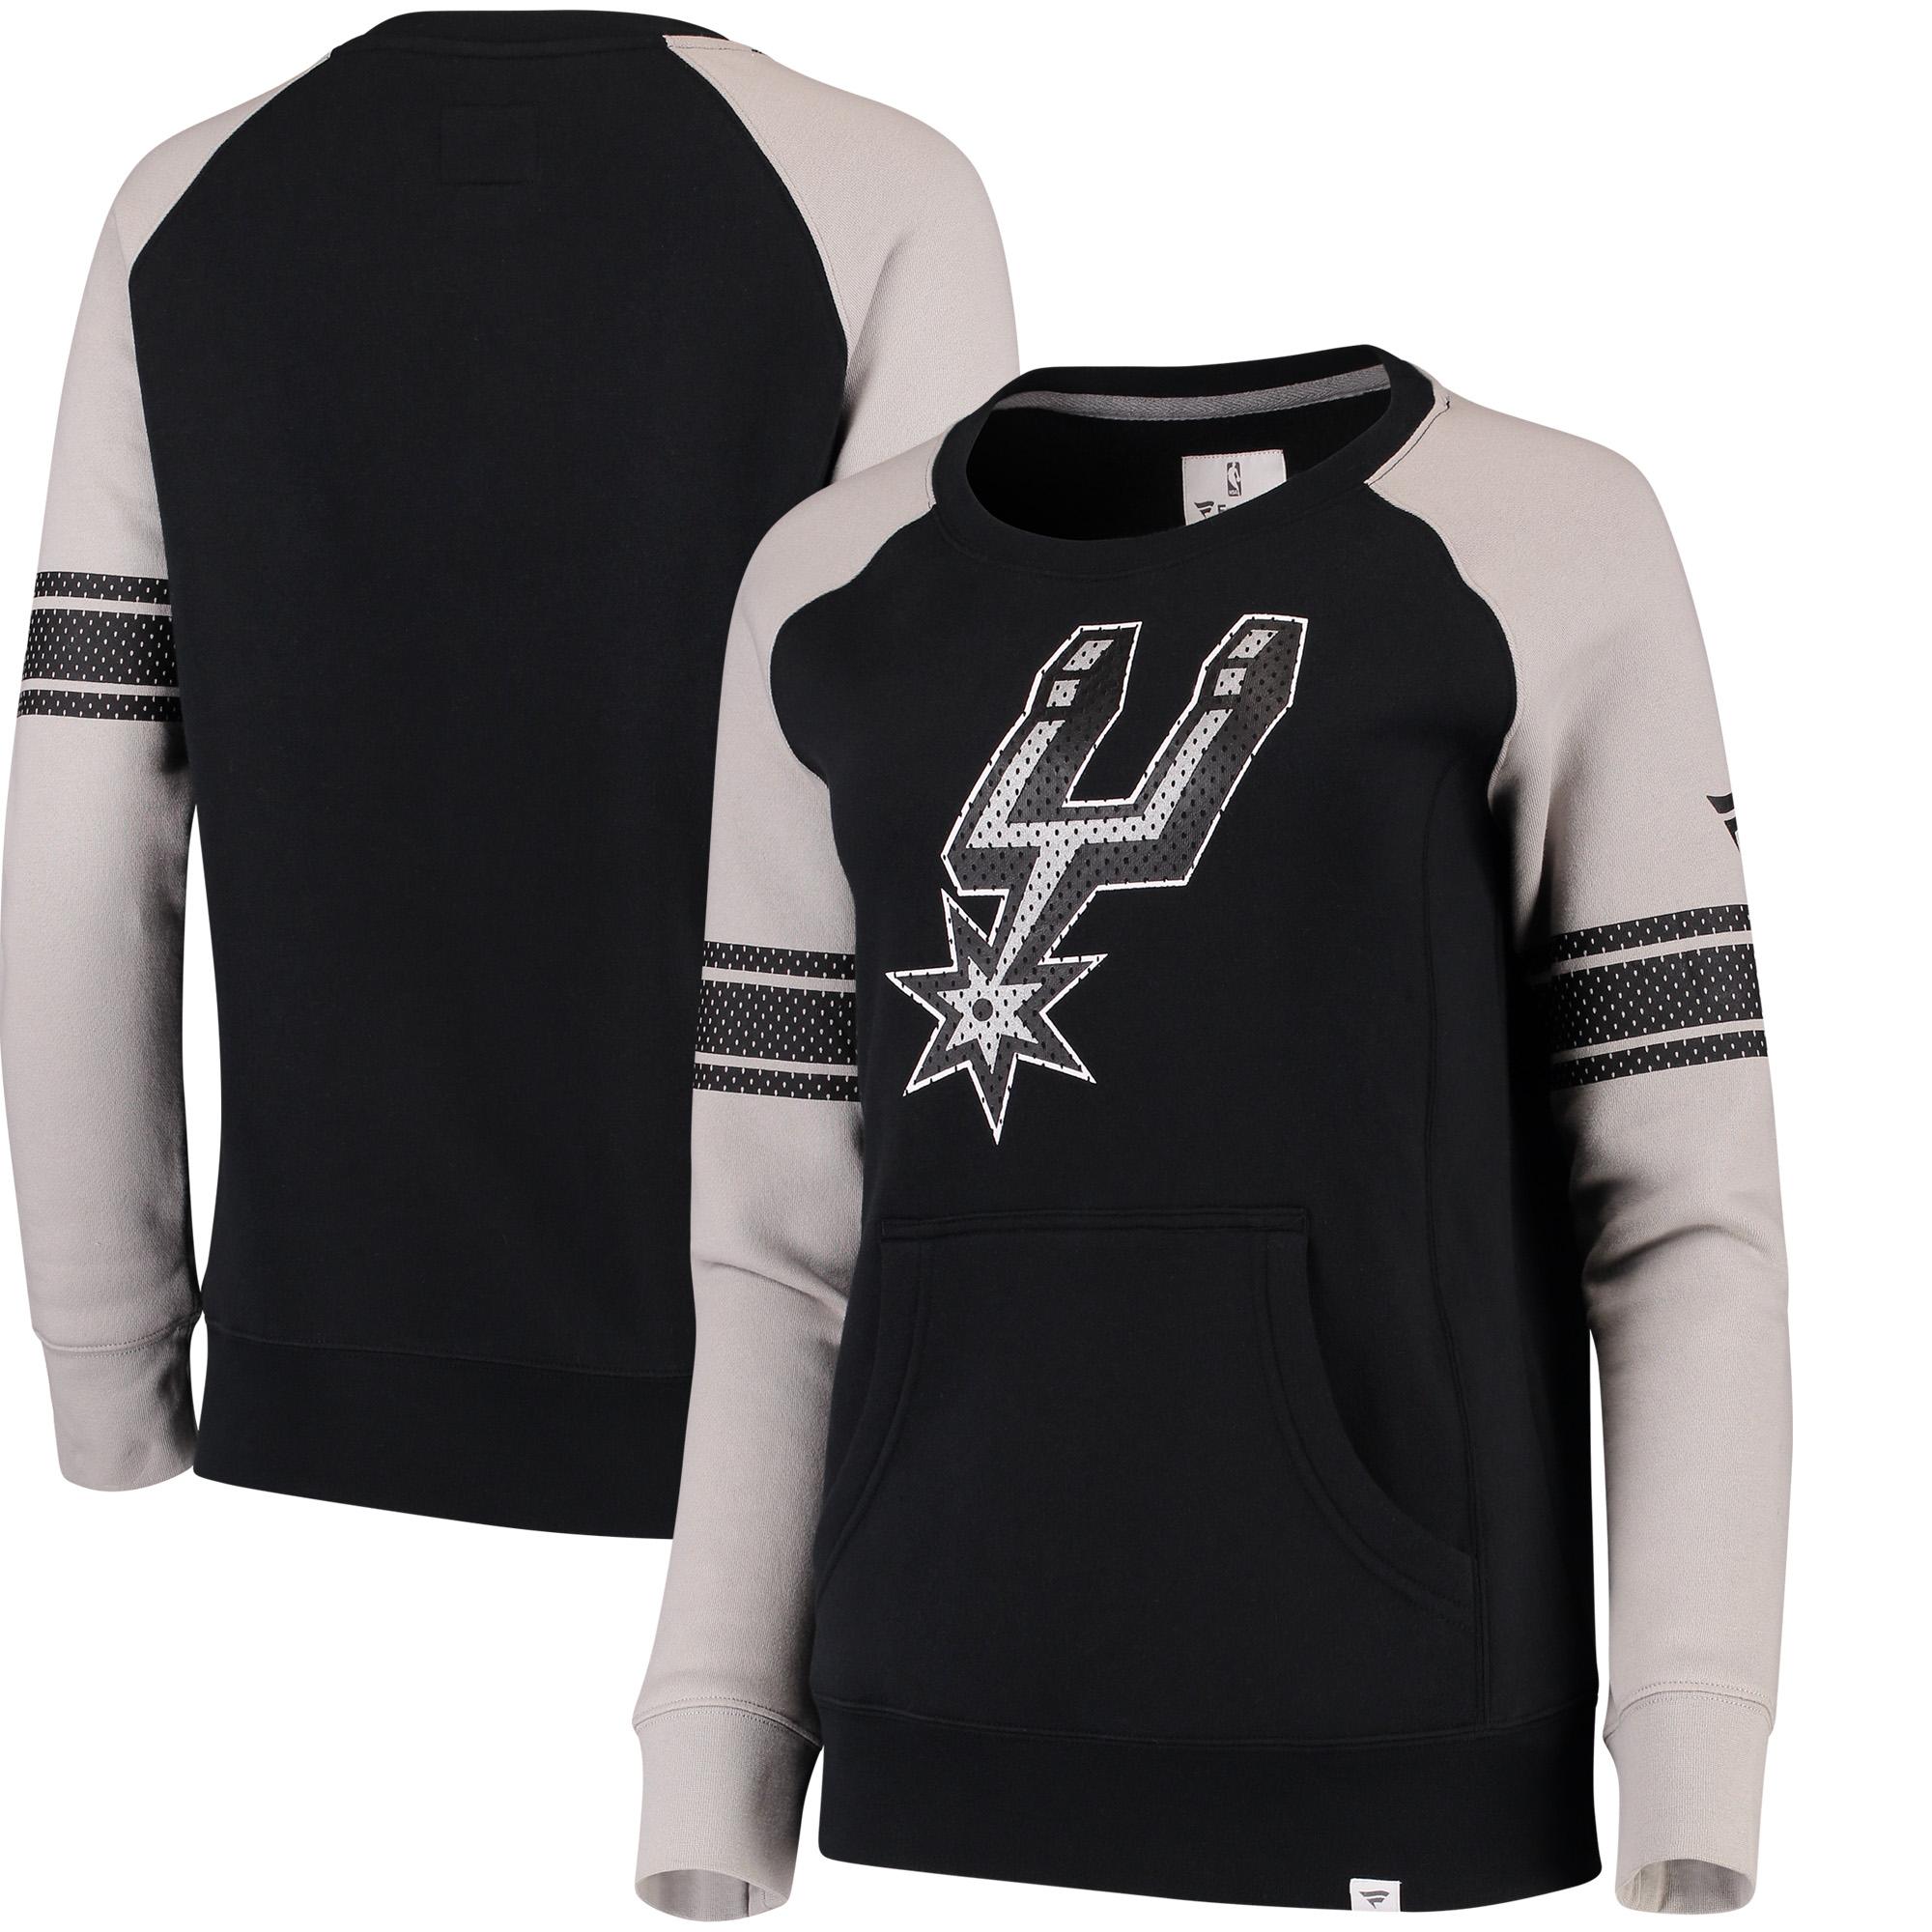 San Antonio Spurs Fanatics Branded Women's Iconic Pullover Sweatshirt - Black/Heathered Gray